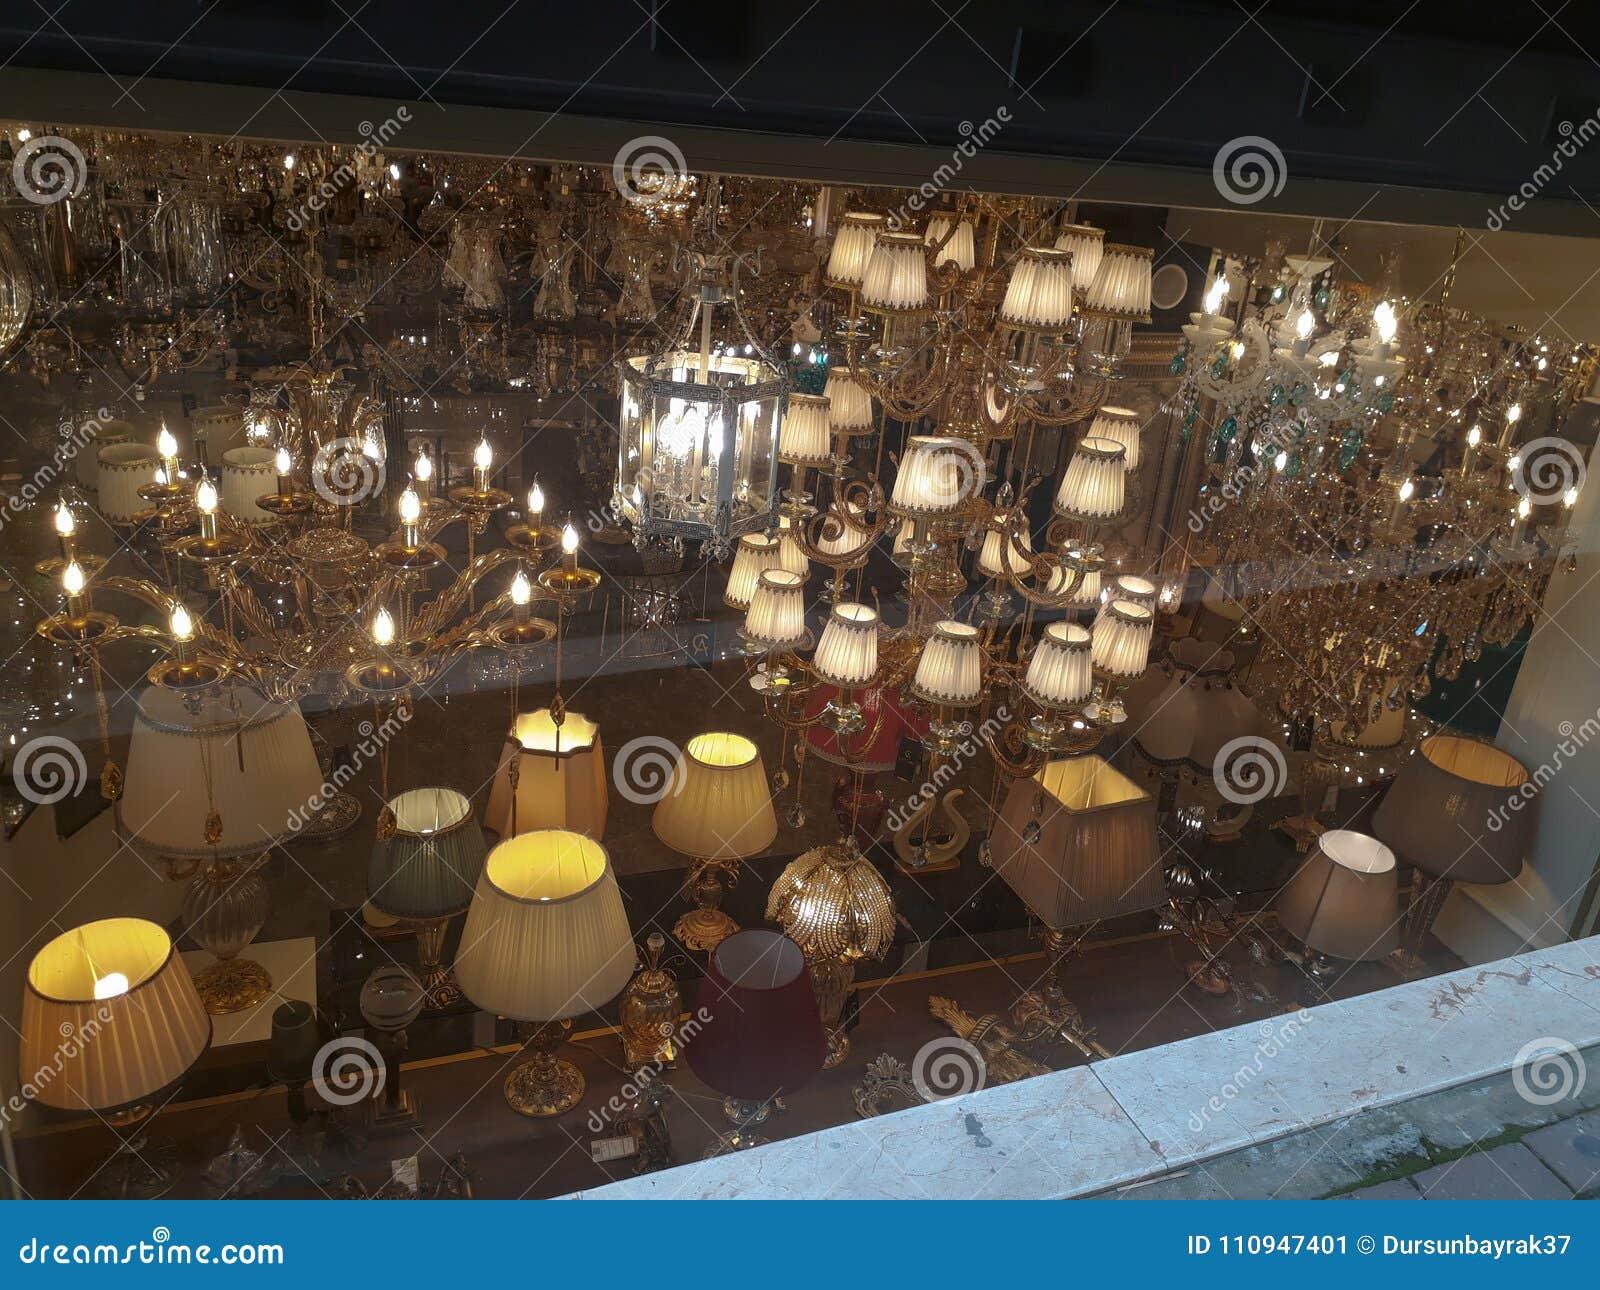 Chandelier & Lampshade Shop in Beyoglu Istanbul